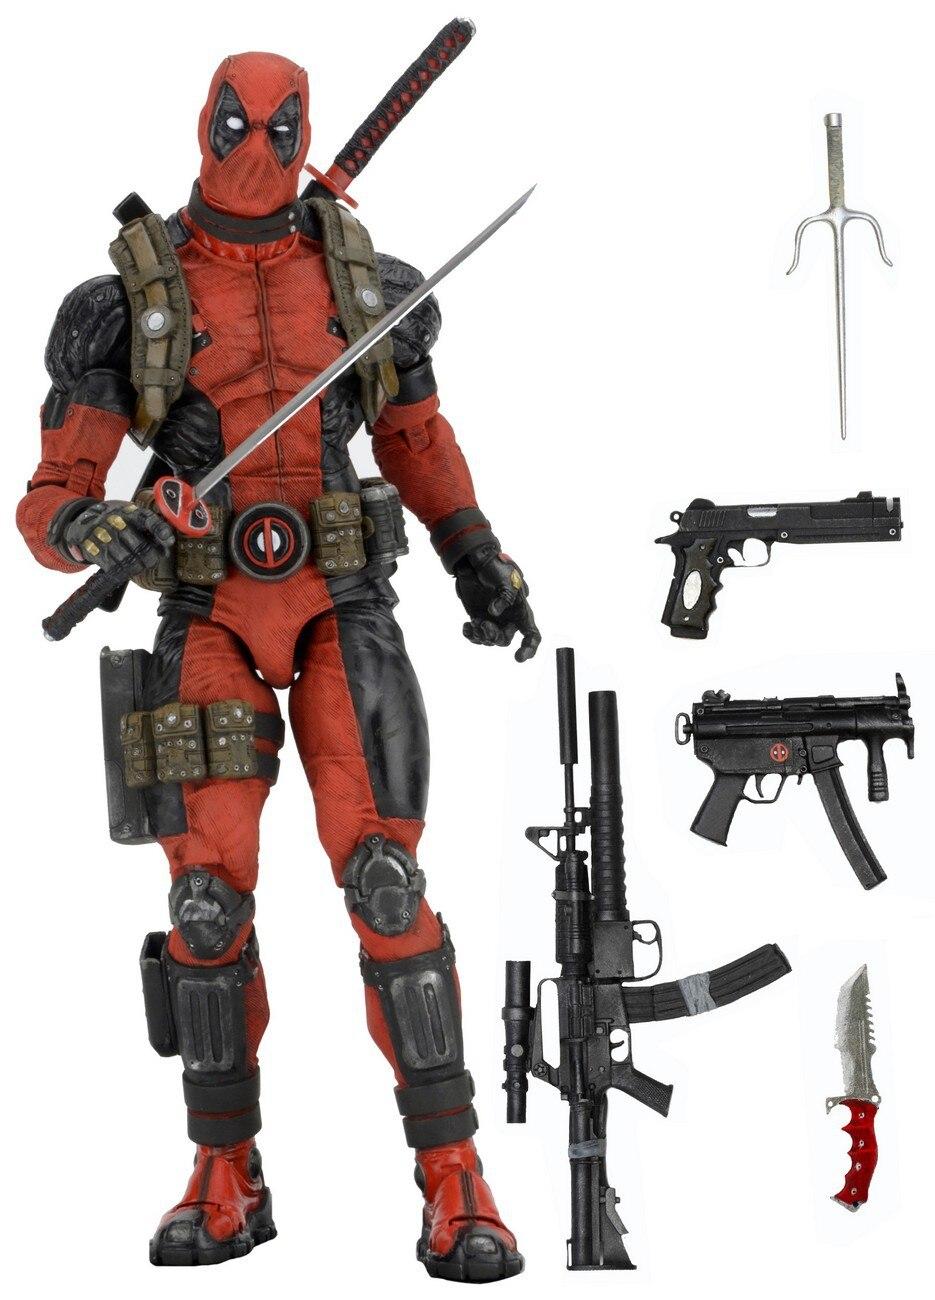 Marvel X-Men Deadpool Joints Moveable Poseable Super Hero Action Figure Model Toys 16cm